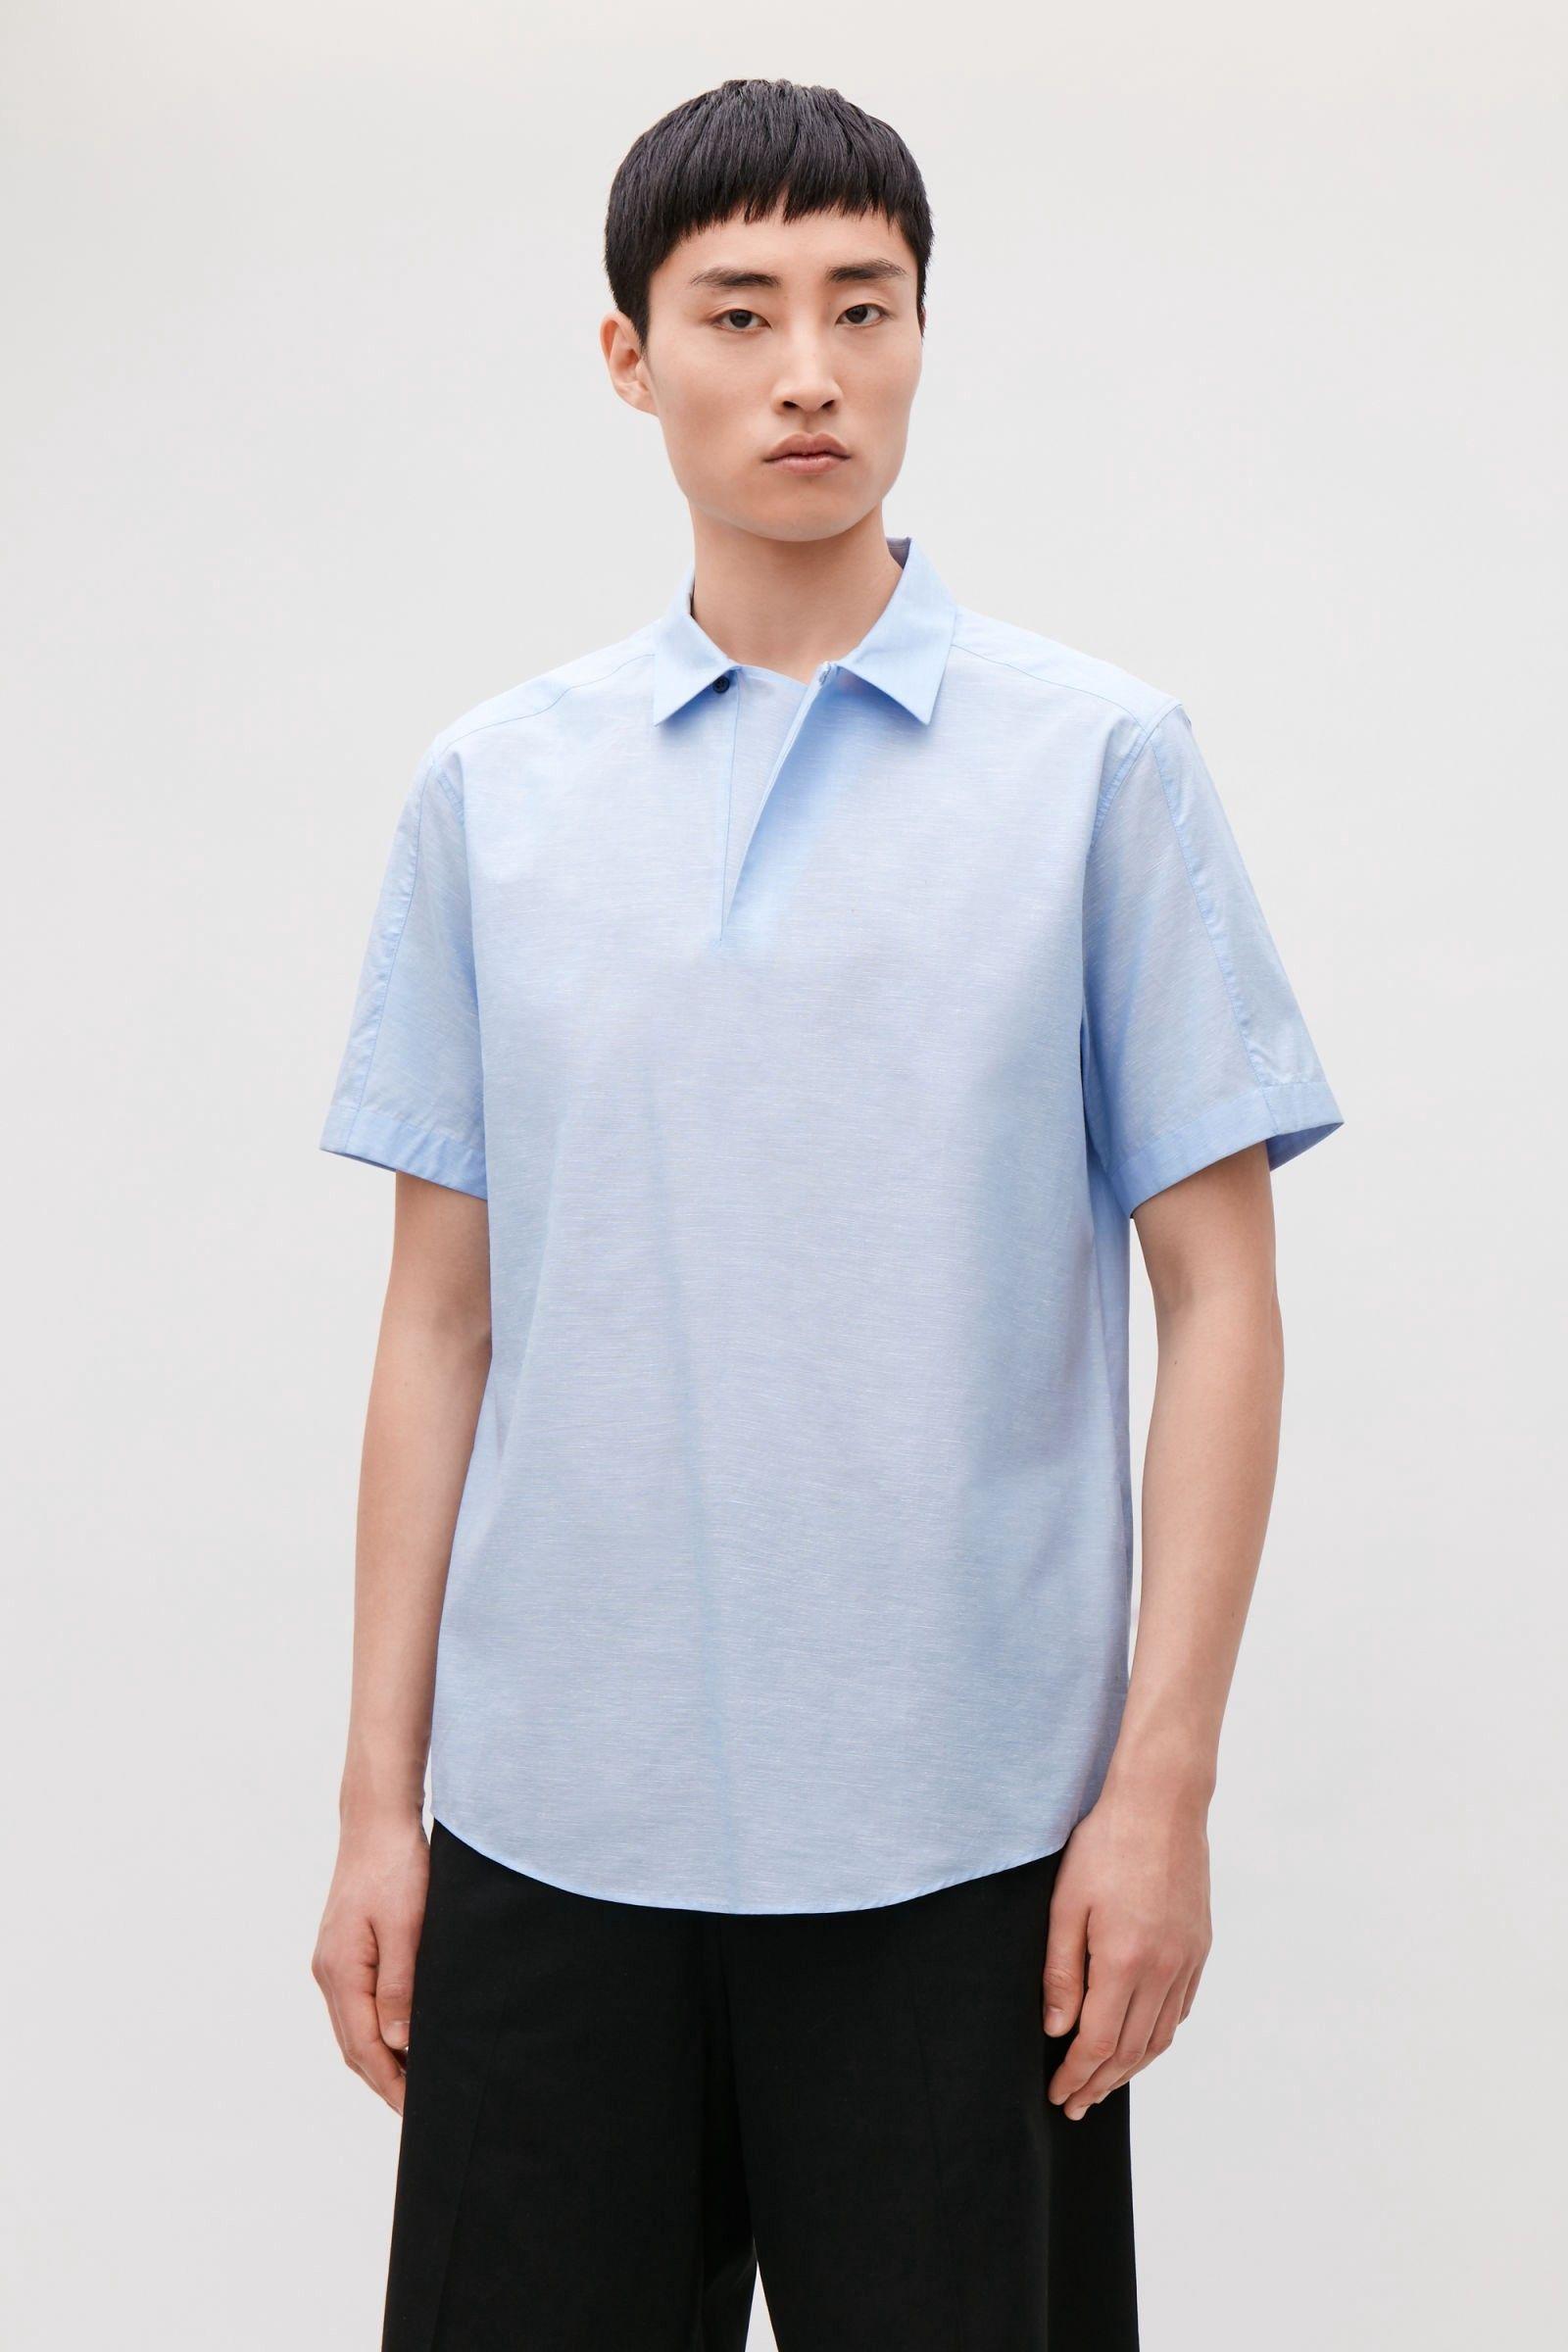 Cos shortsleeved melange shirt light blue s products